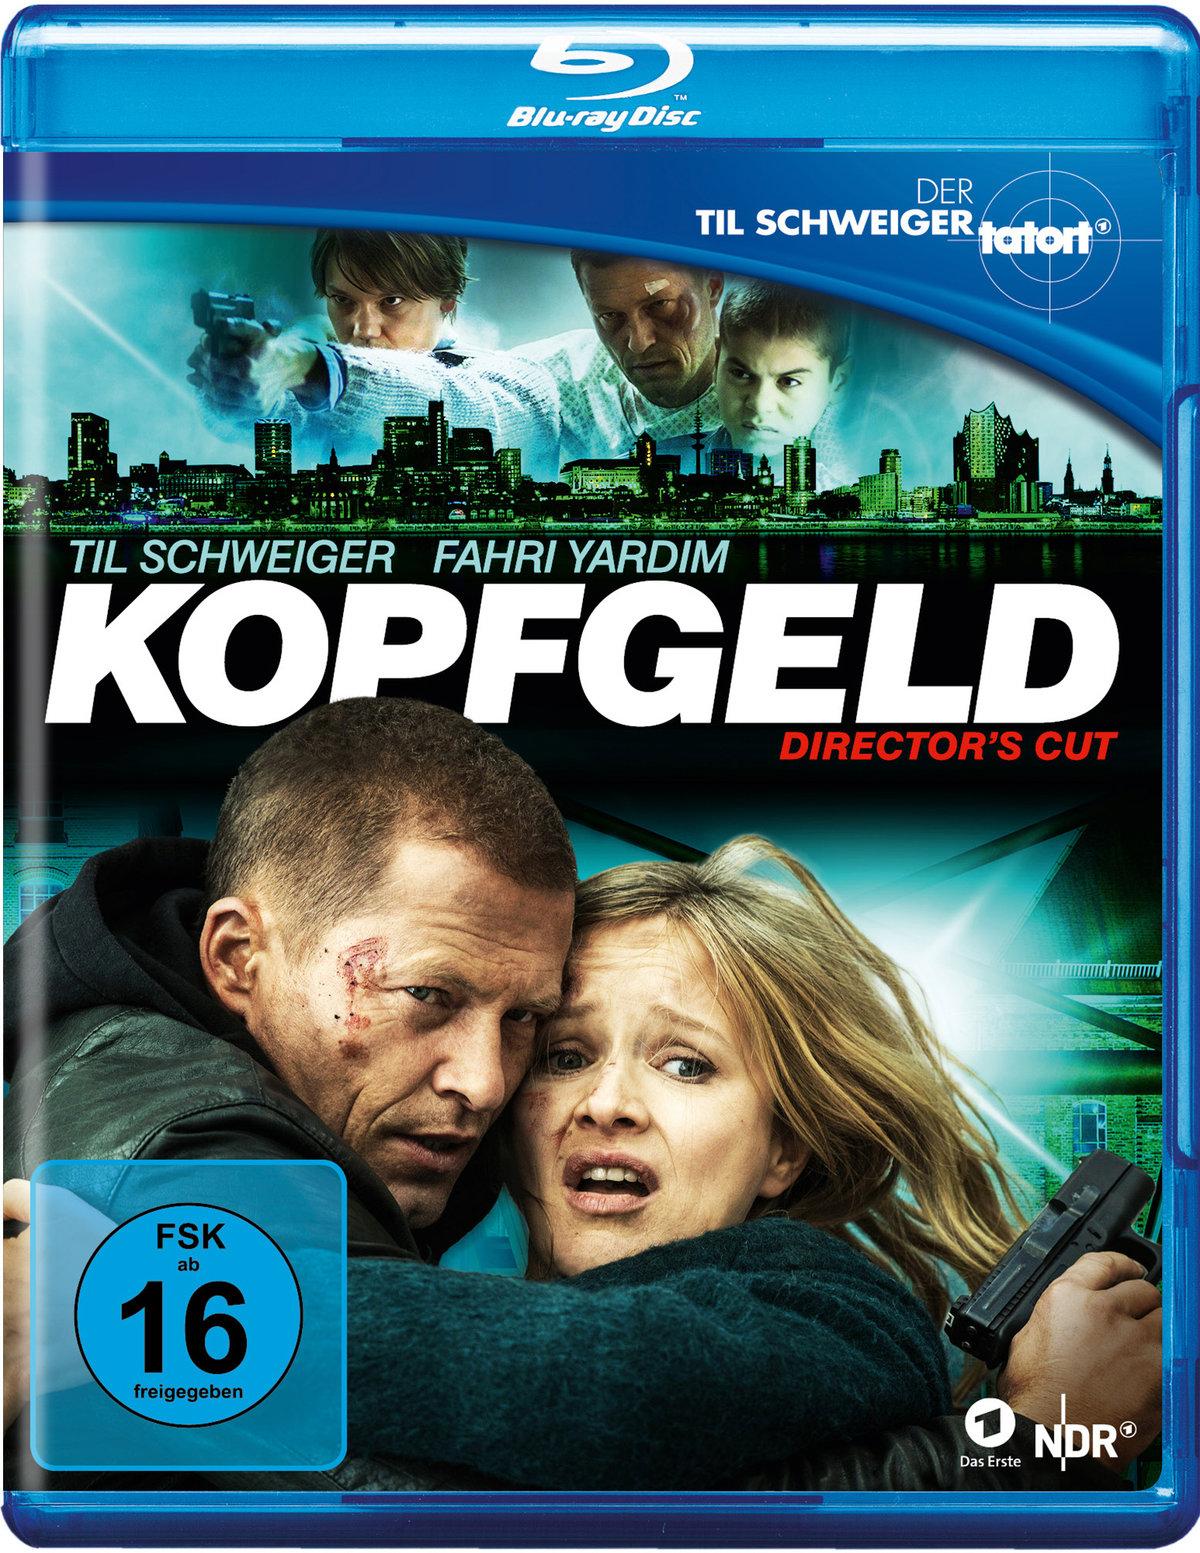 Tatort - Kopfgeld (Director's Cut)